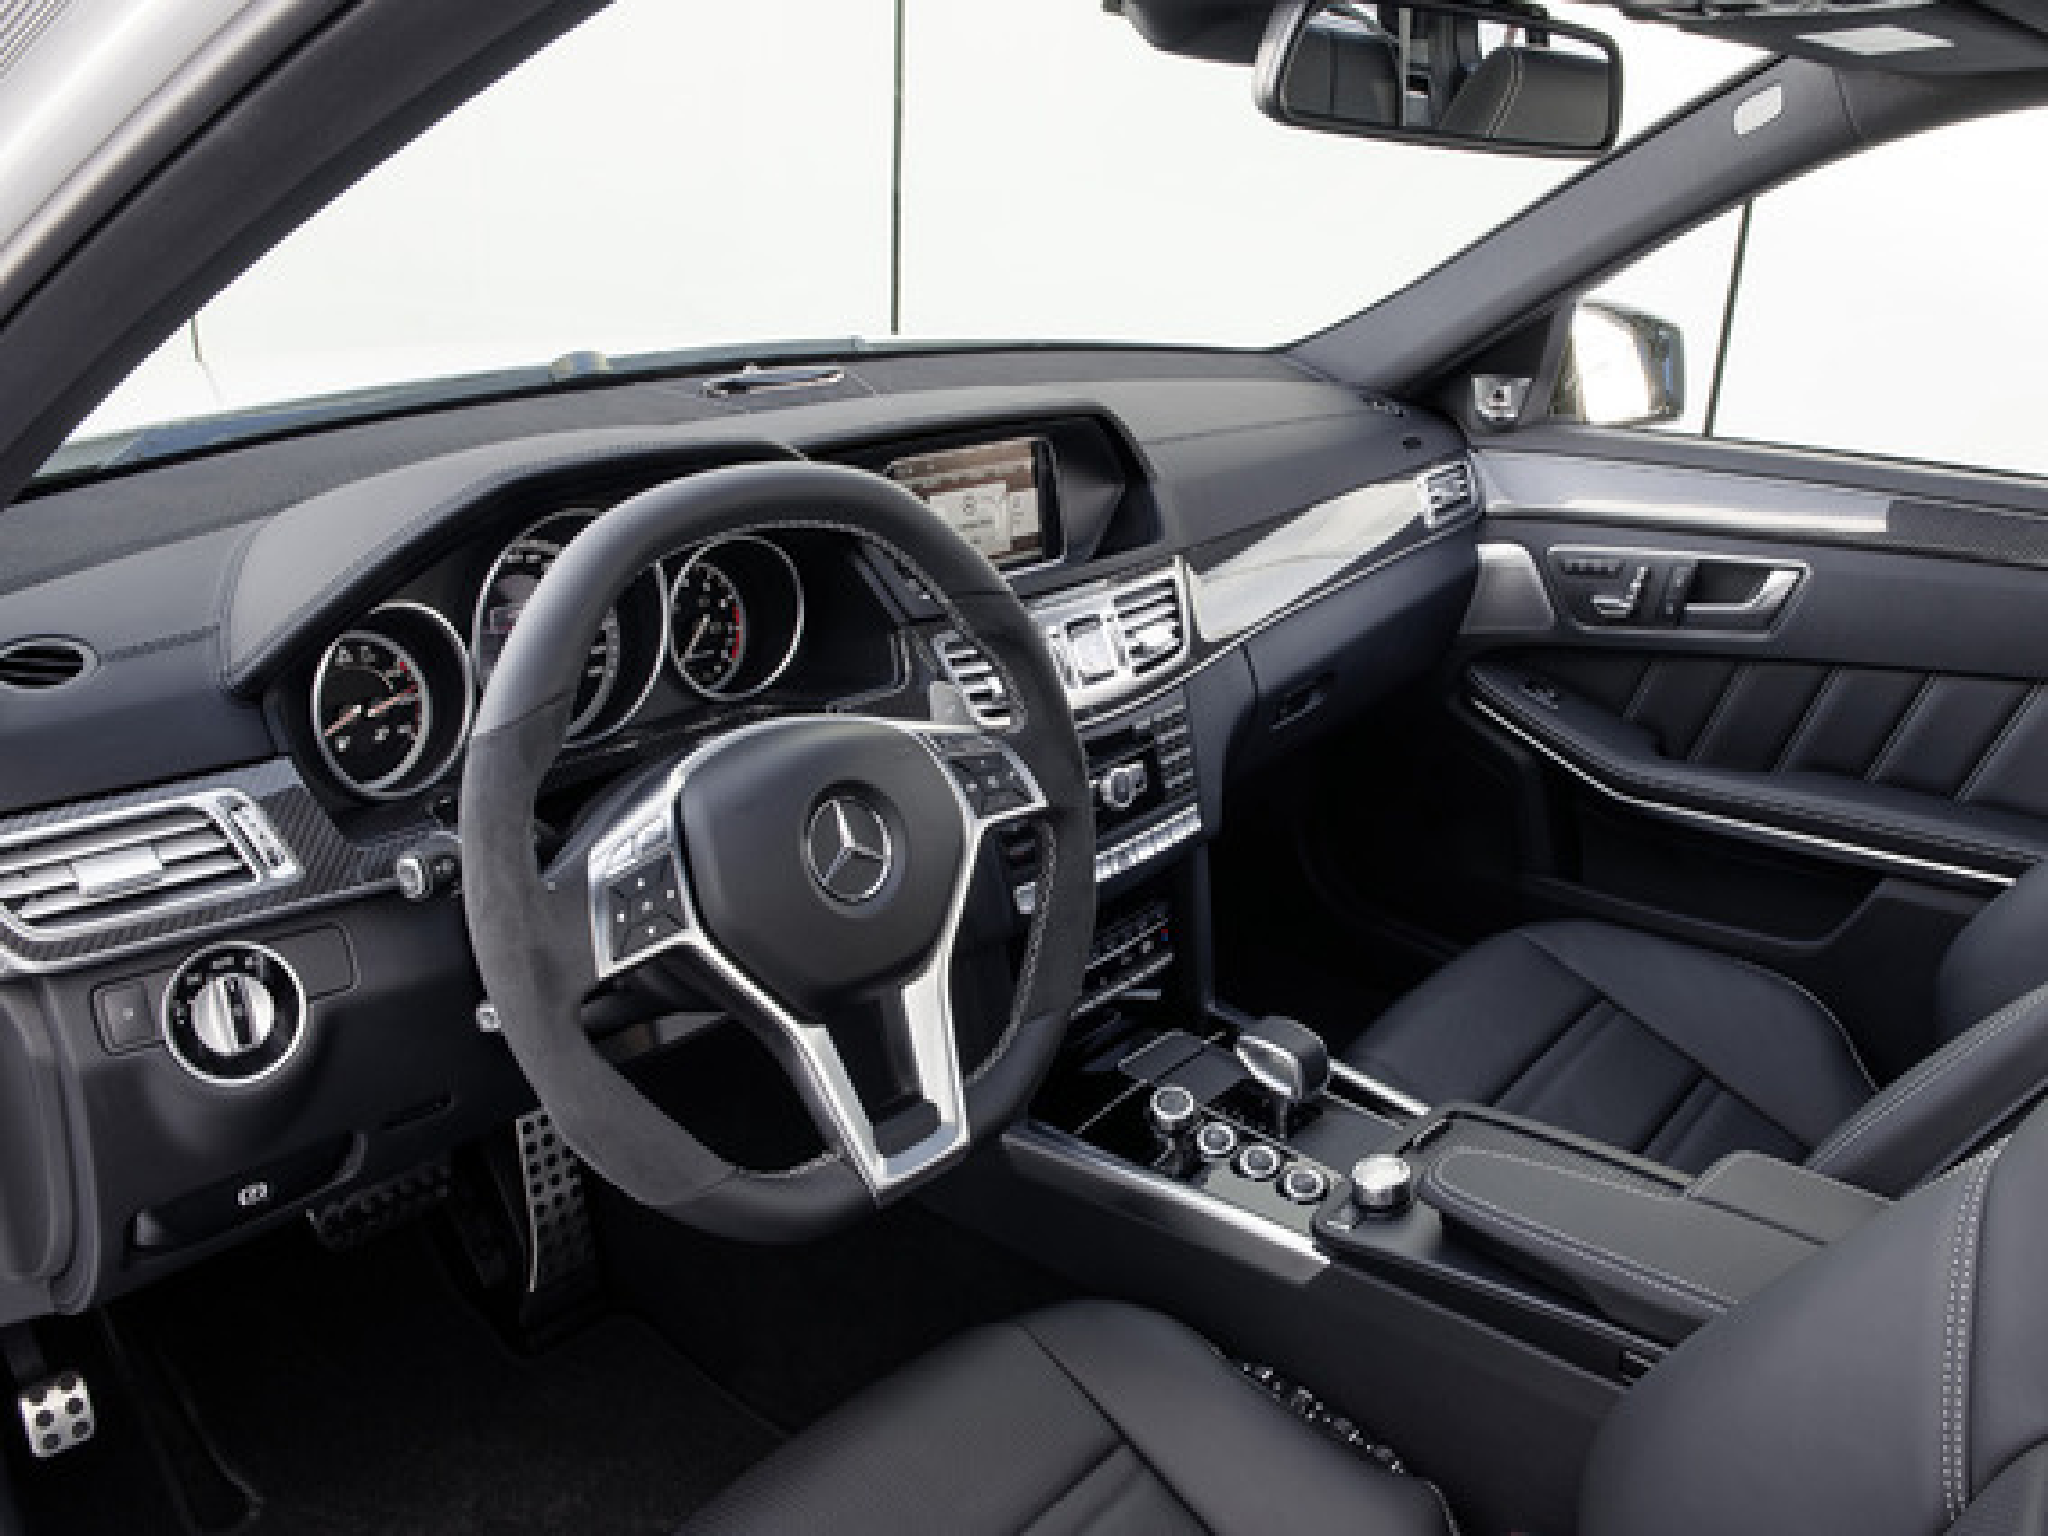 Как обновить прошивку АКПП Mercedes E-Class (W212)